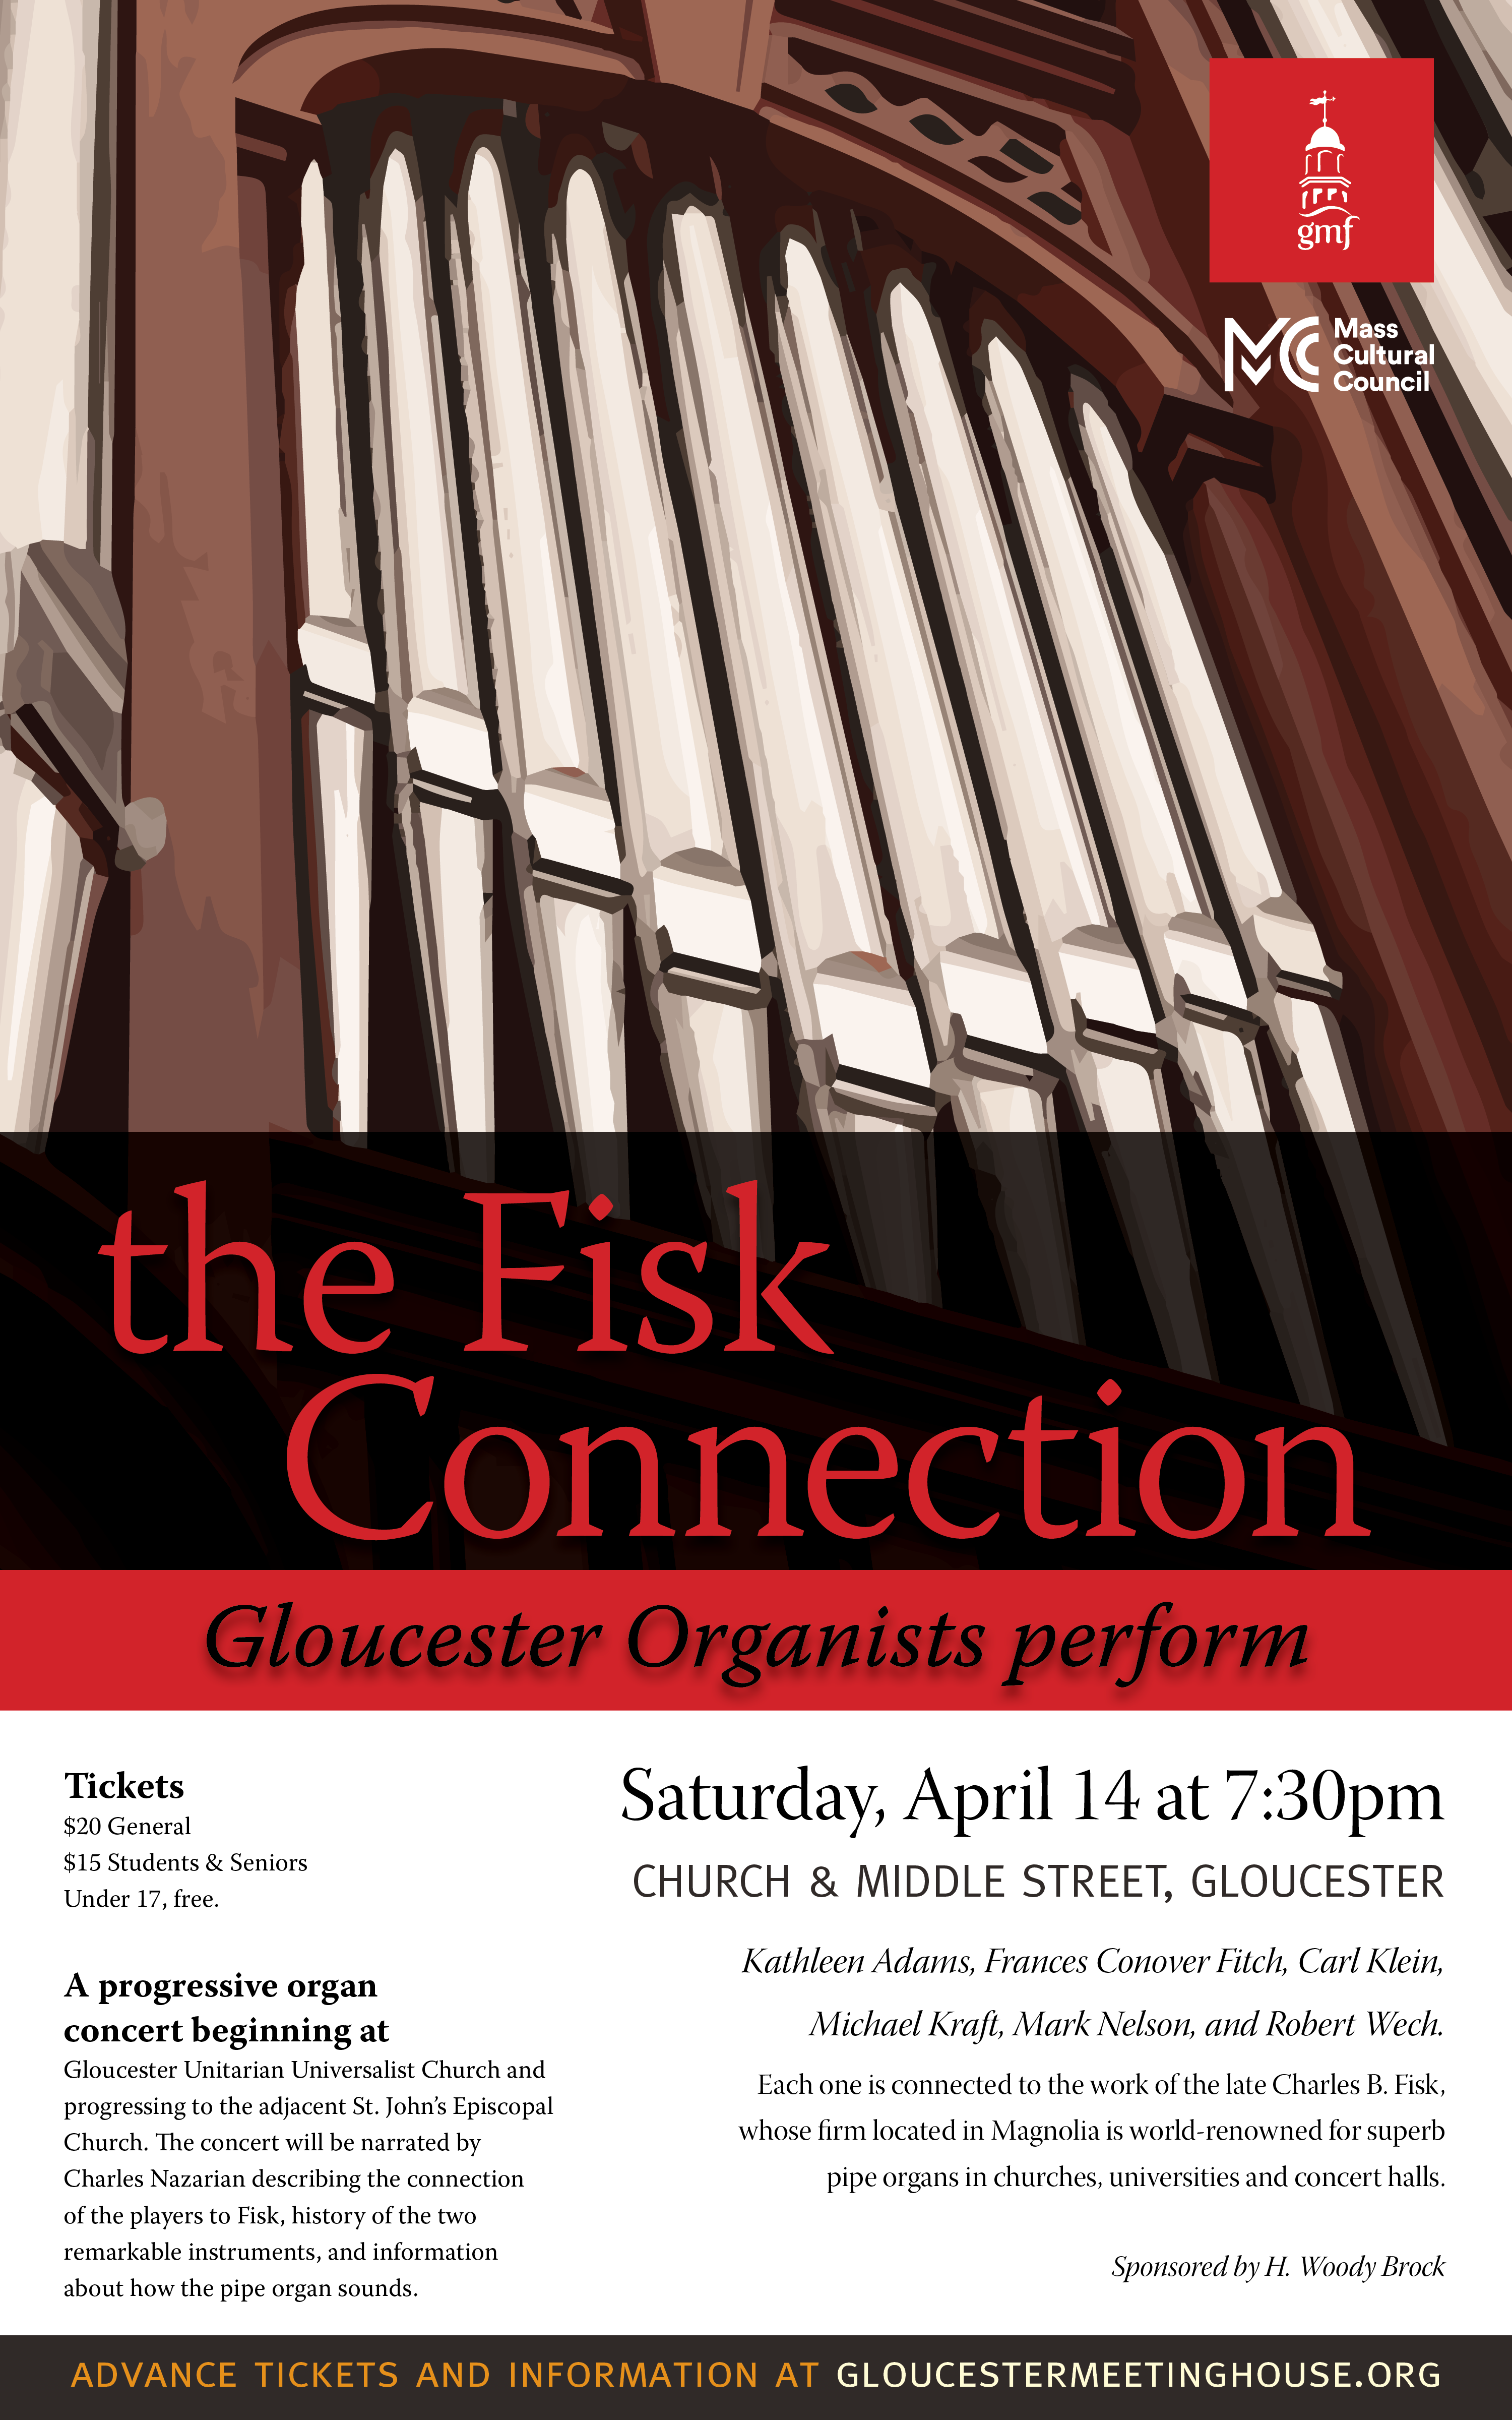 Fisk Connection Organ Concert Poster